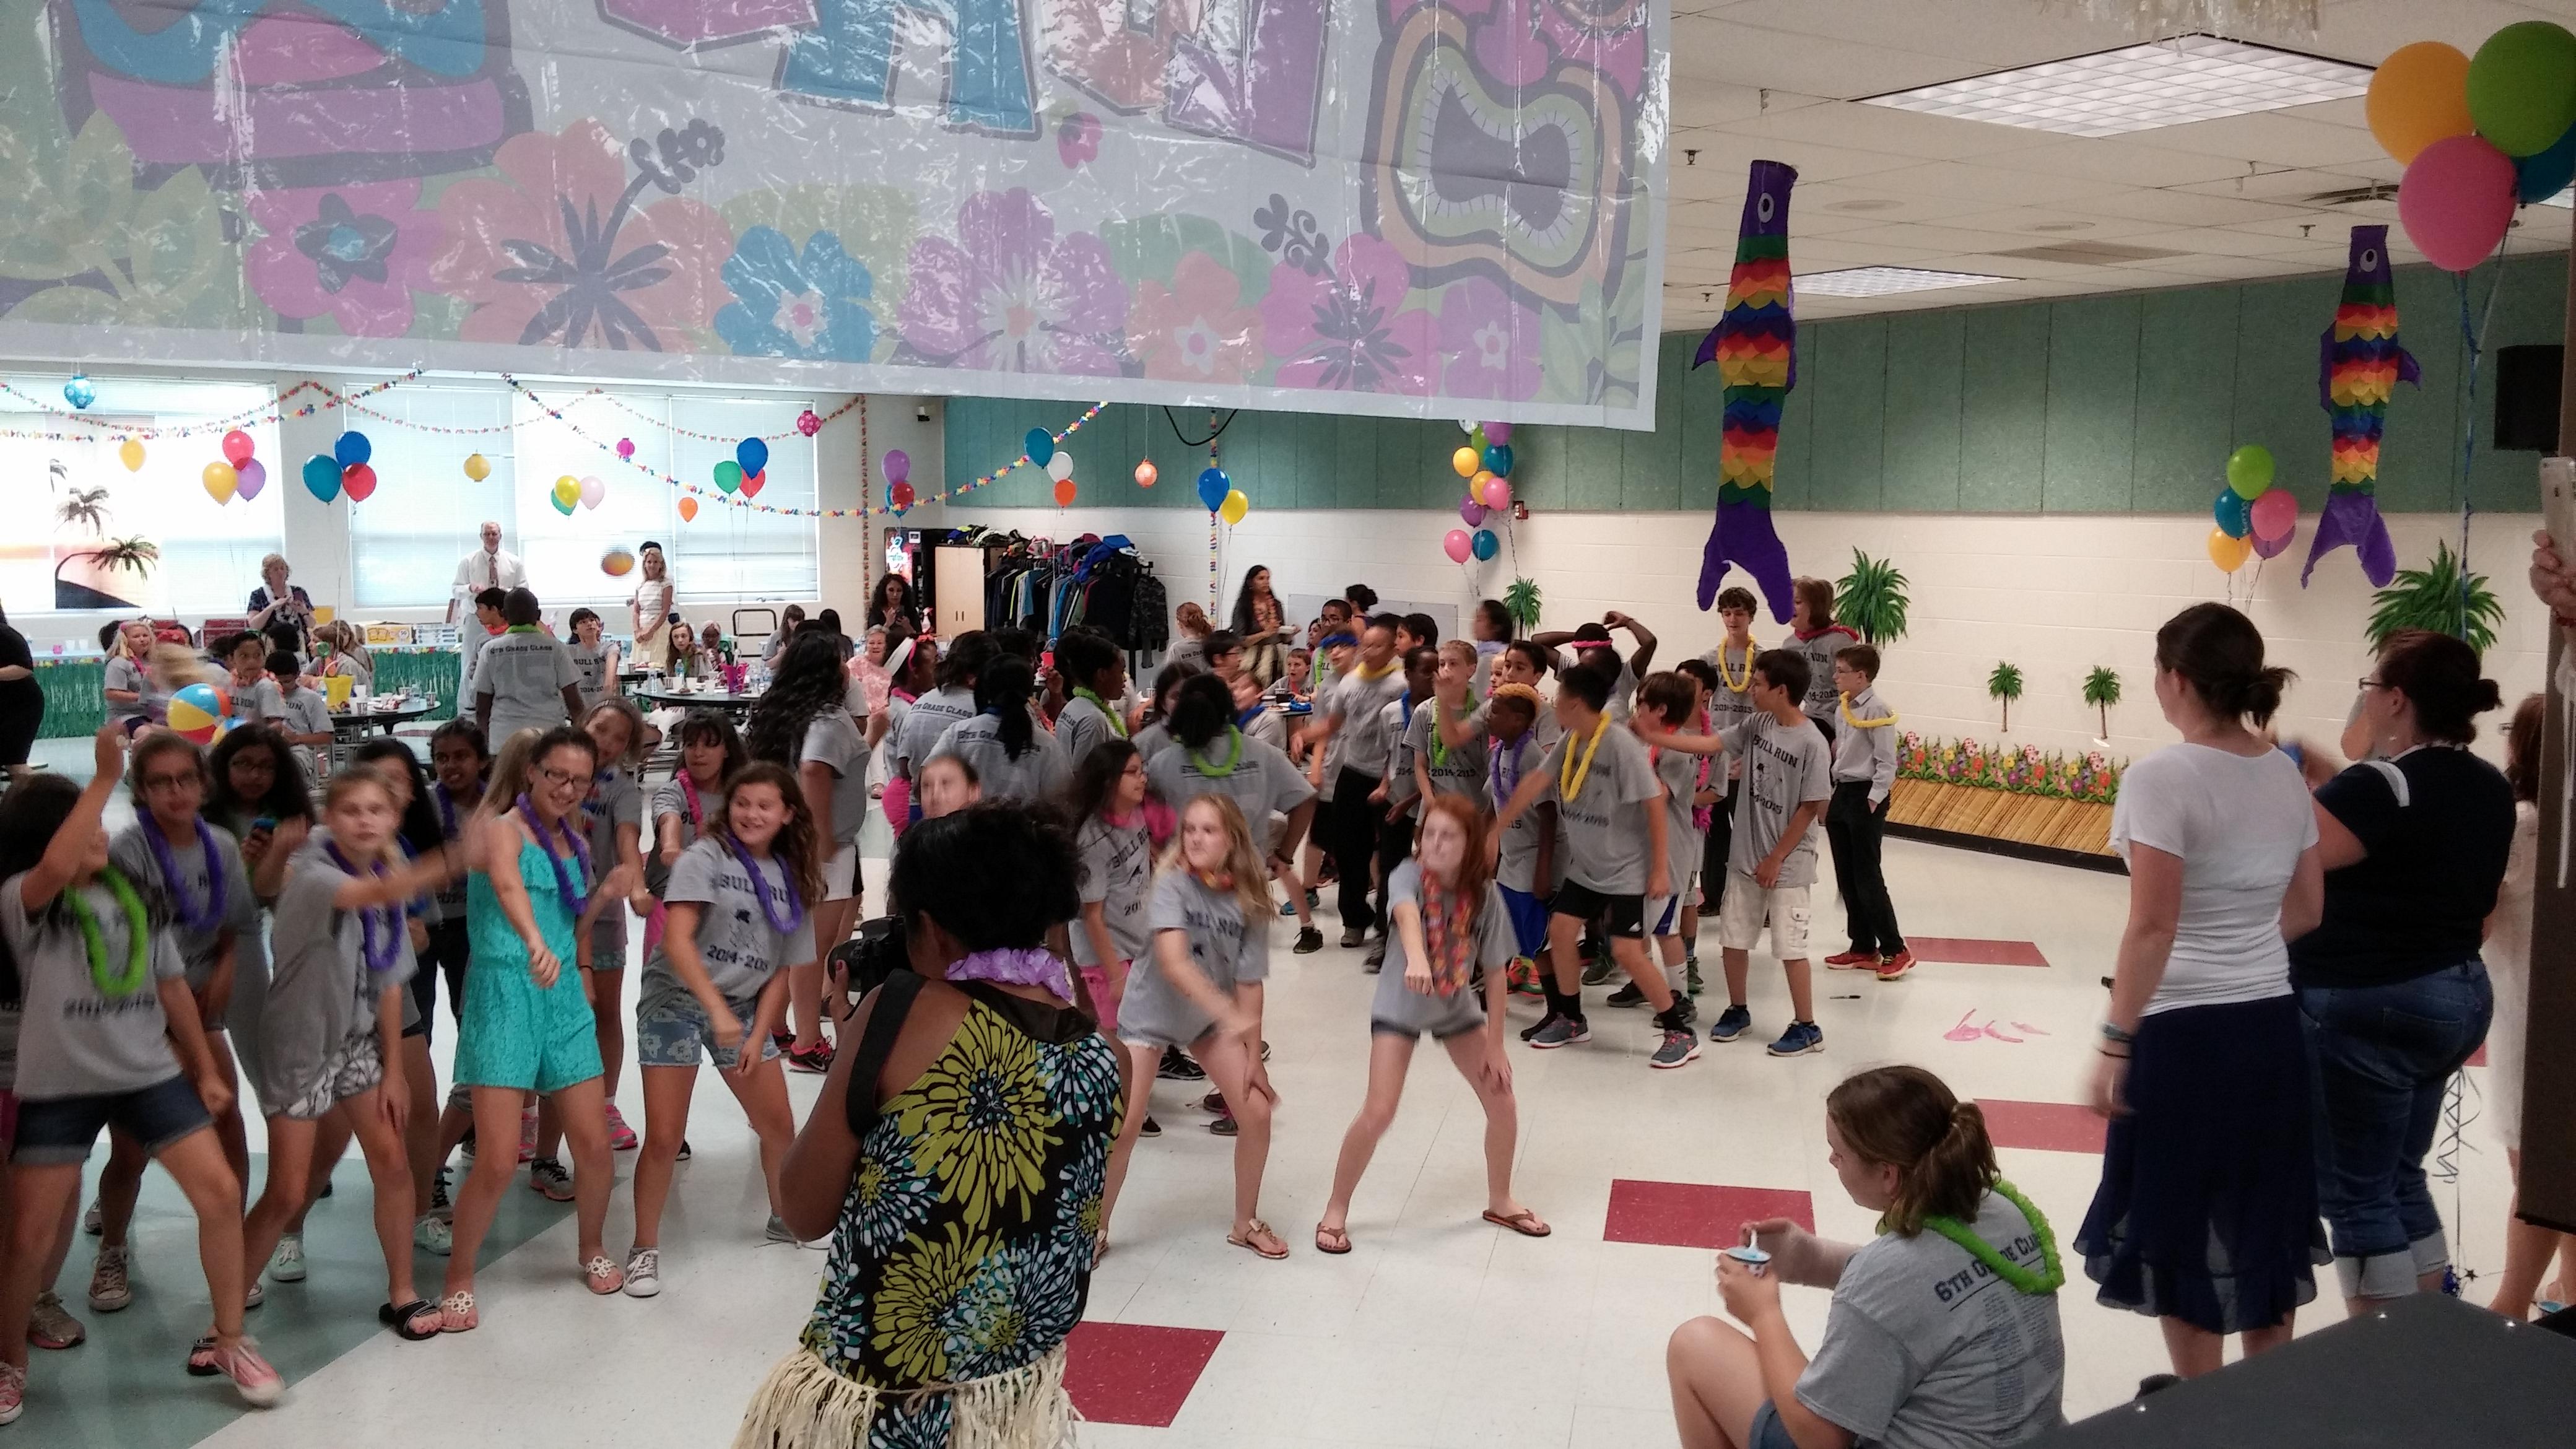 bobby-g's-disc-jockeys-school-dances-1